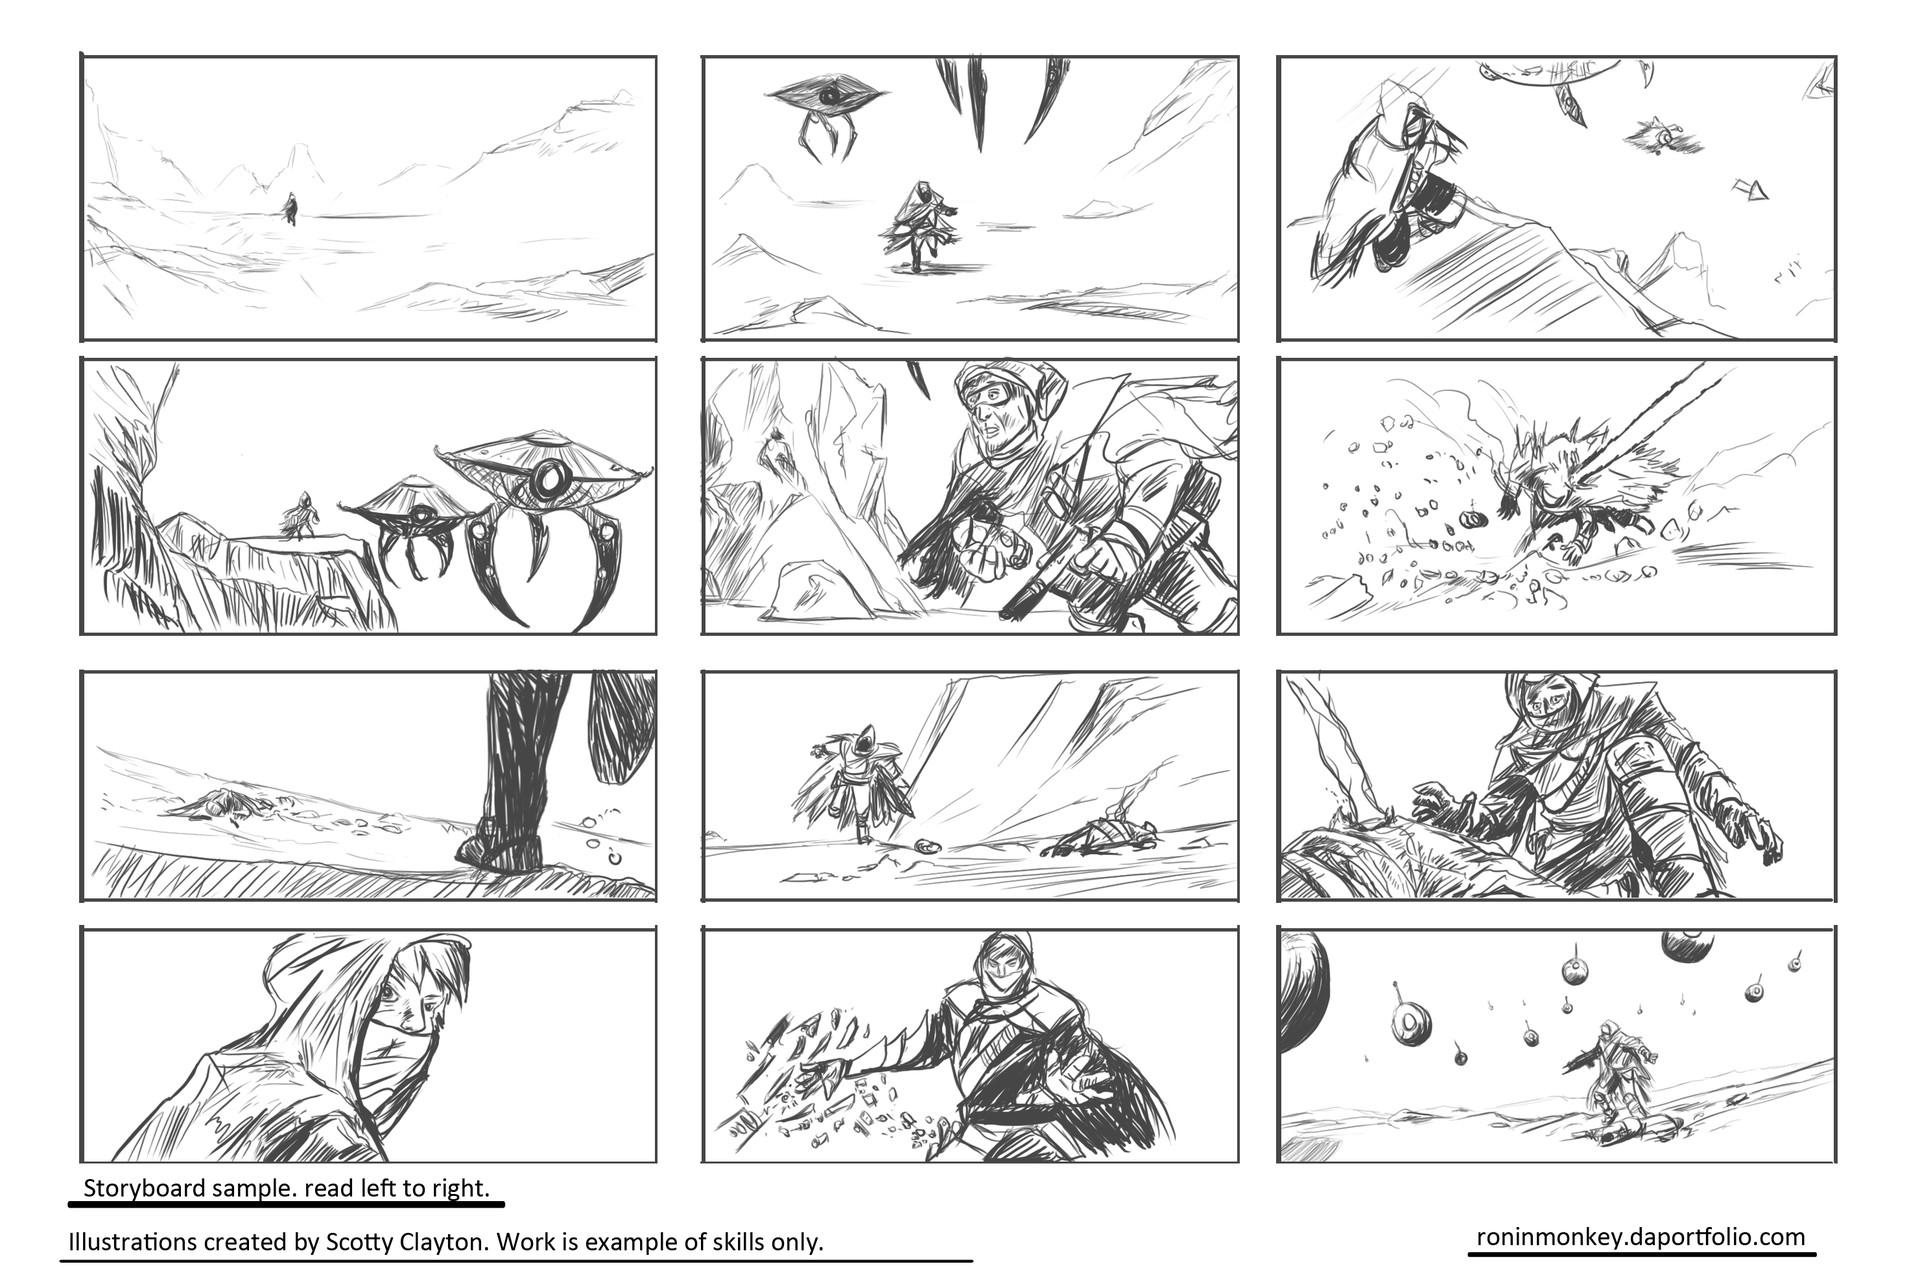 Scotty Clayton Storyboard Sample sheet 1a – Storyboard Sample